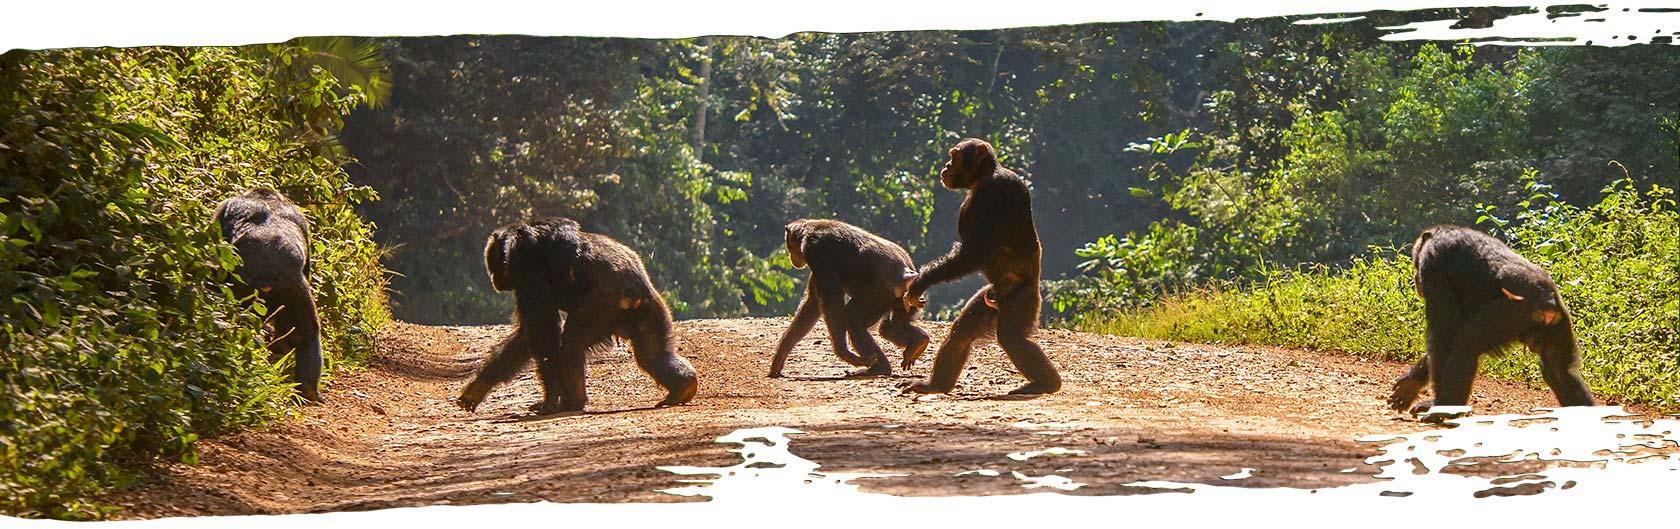 Chimps walking across a path